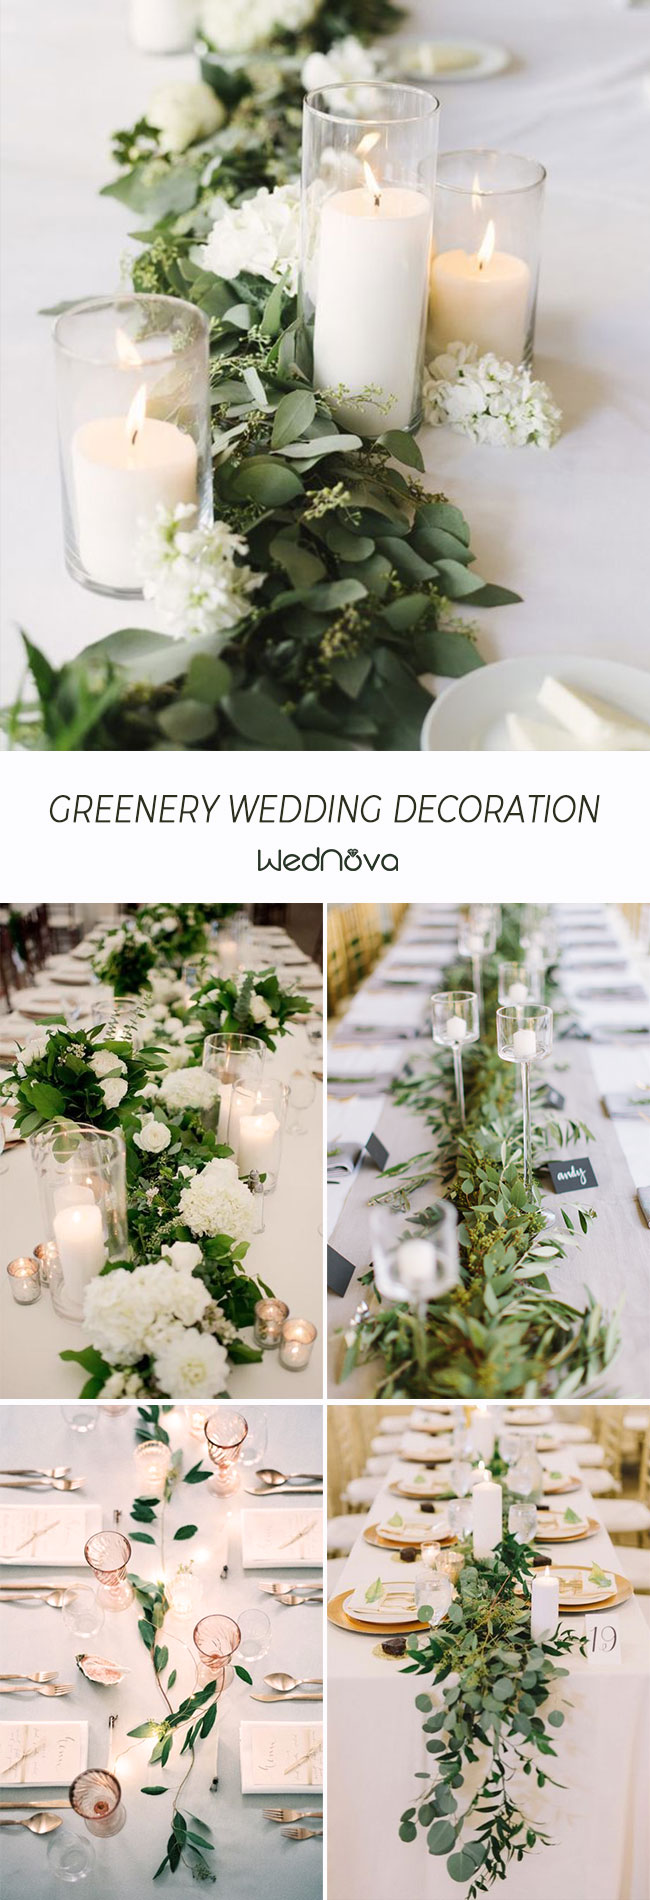 50+ Greenery Wedding Ideas to Inspire Your Big Day - WedNova Blog